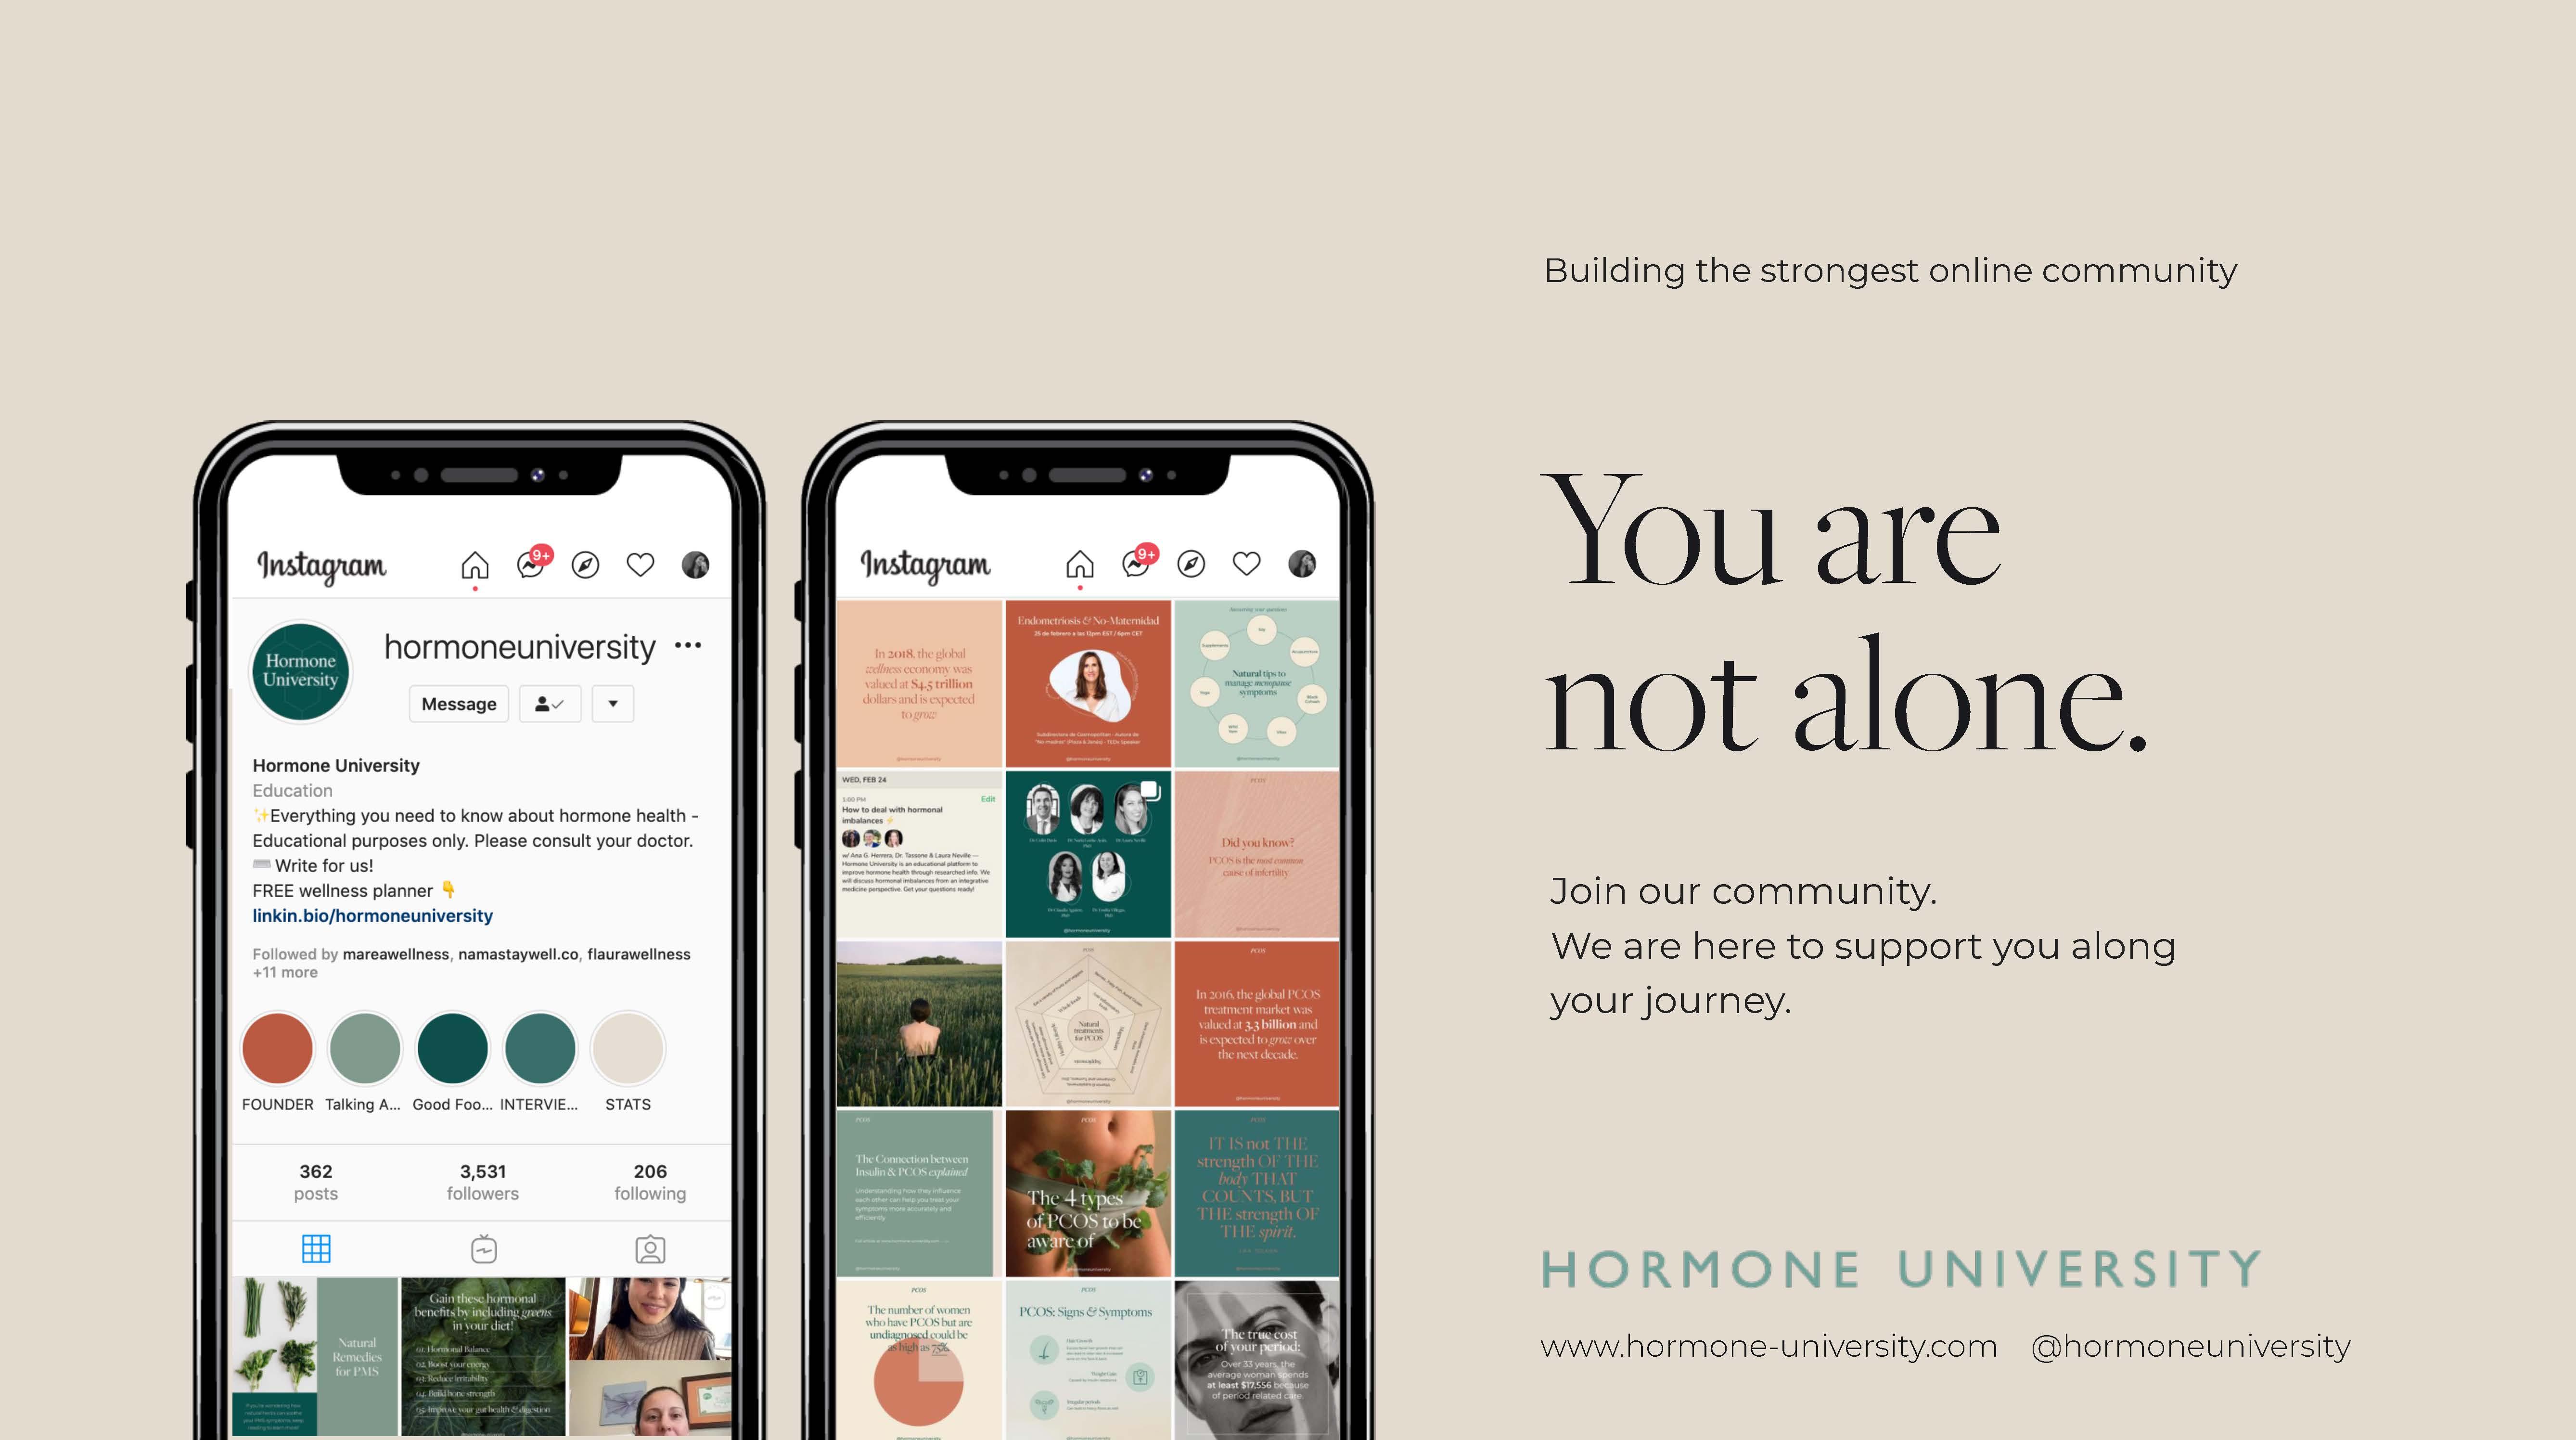 Endofound and Hormone University